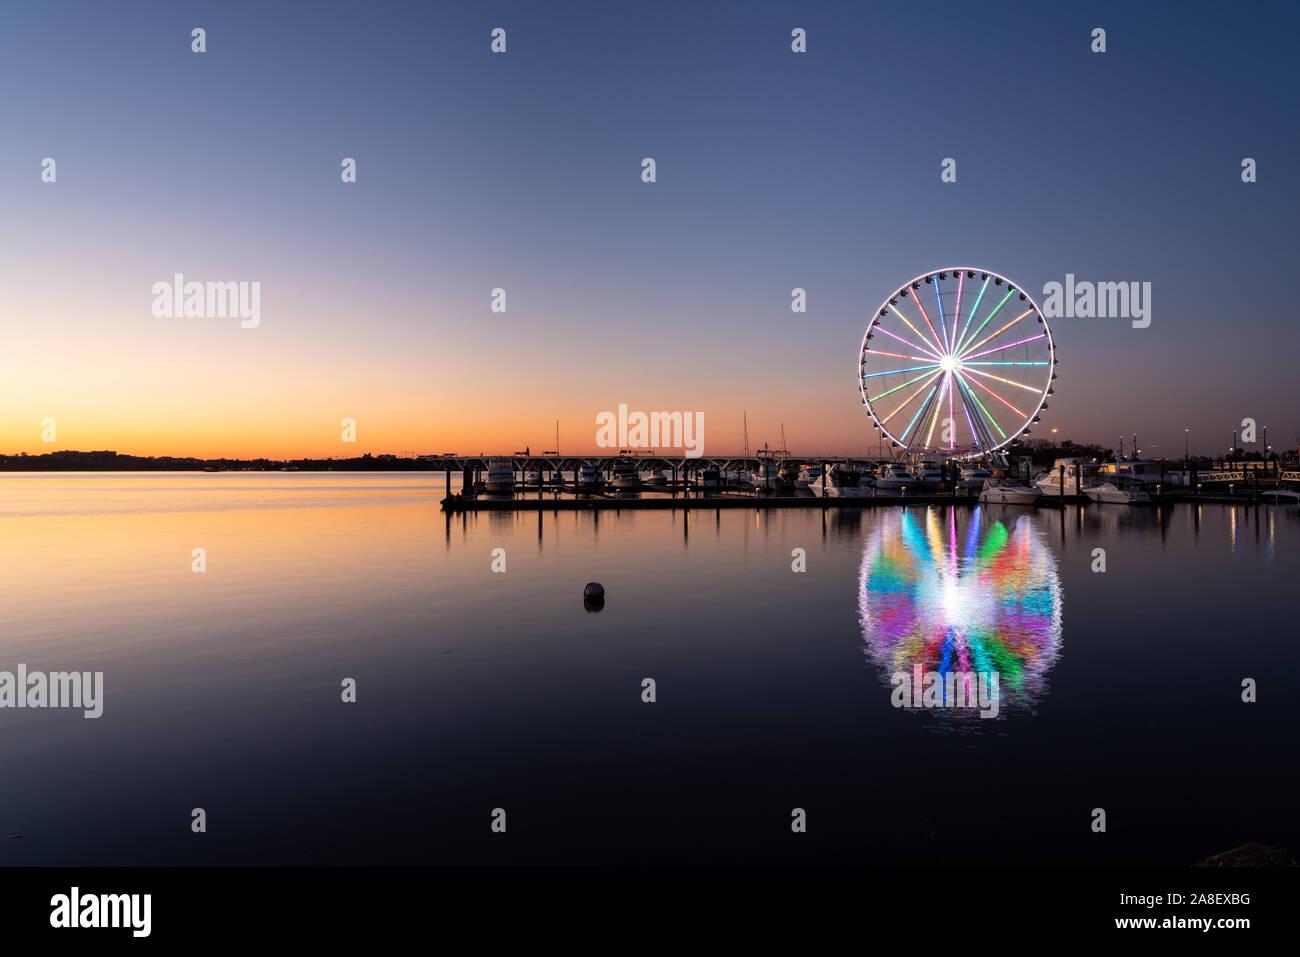 Illuminated ferris wheel at National Harbor near the nation capital of Washington DC at sunset Stock Photo